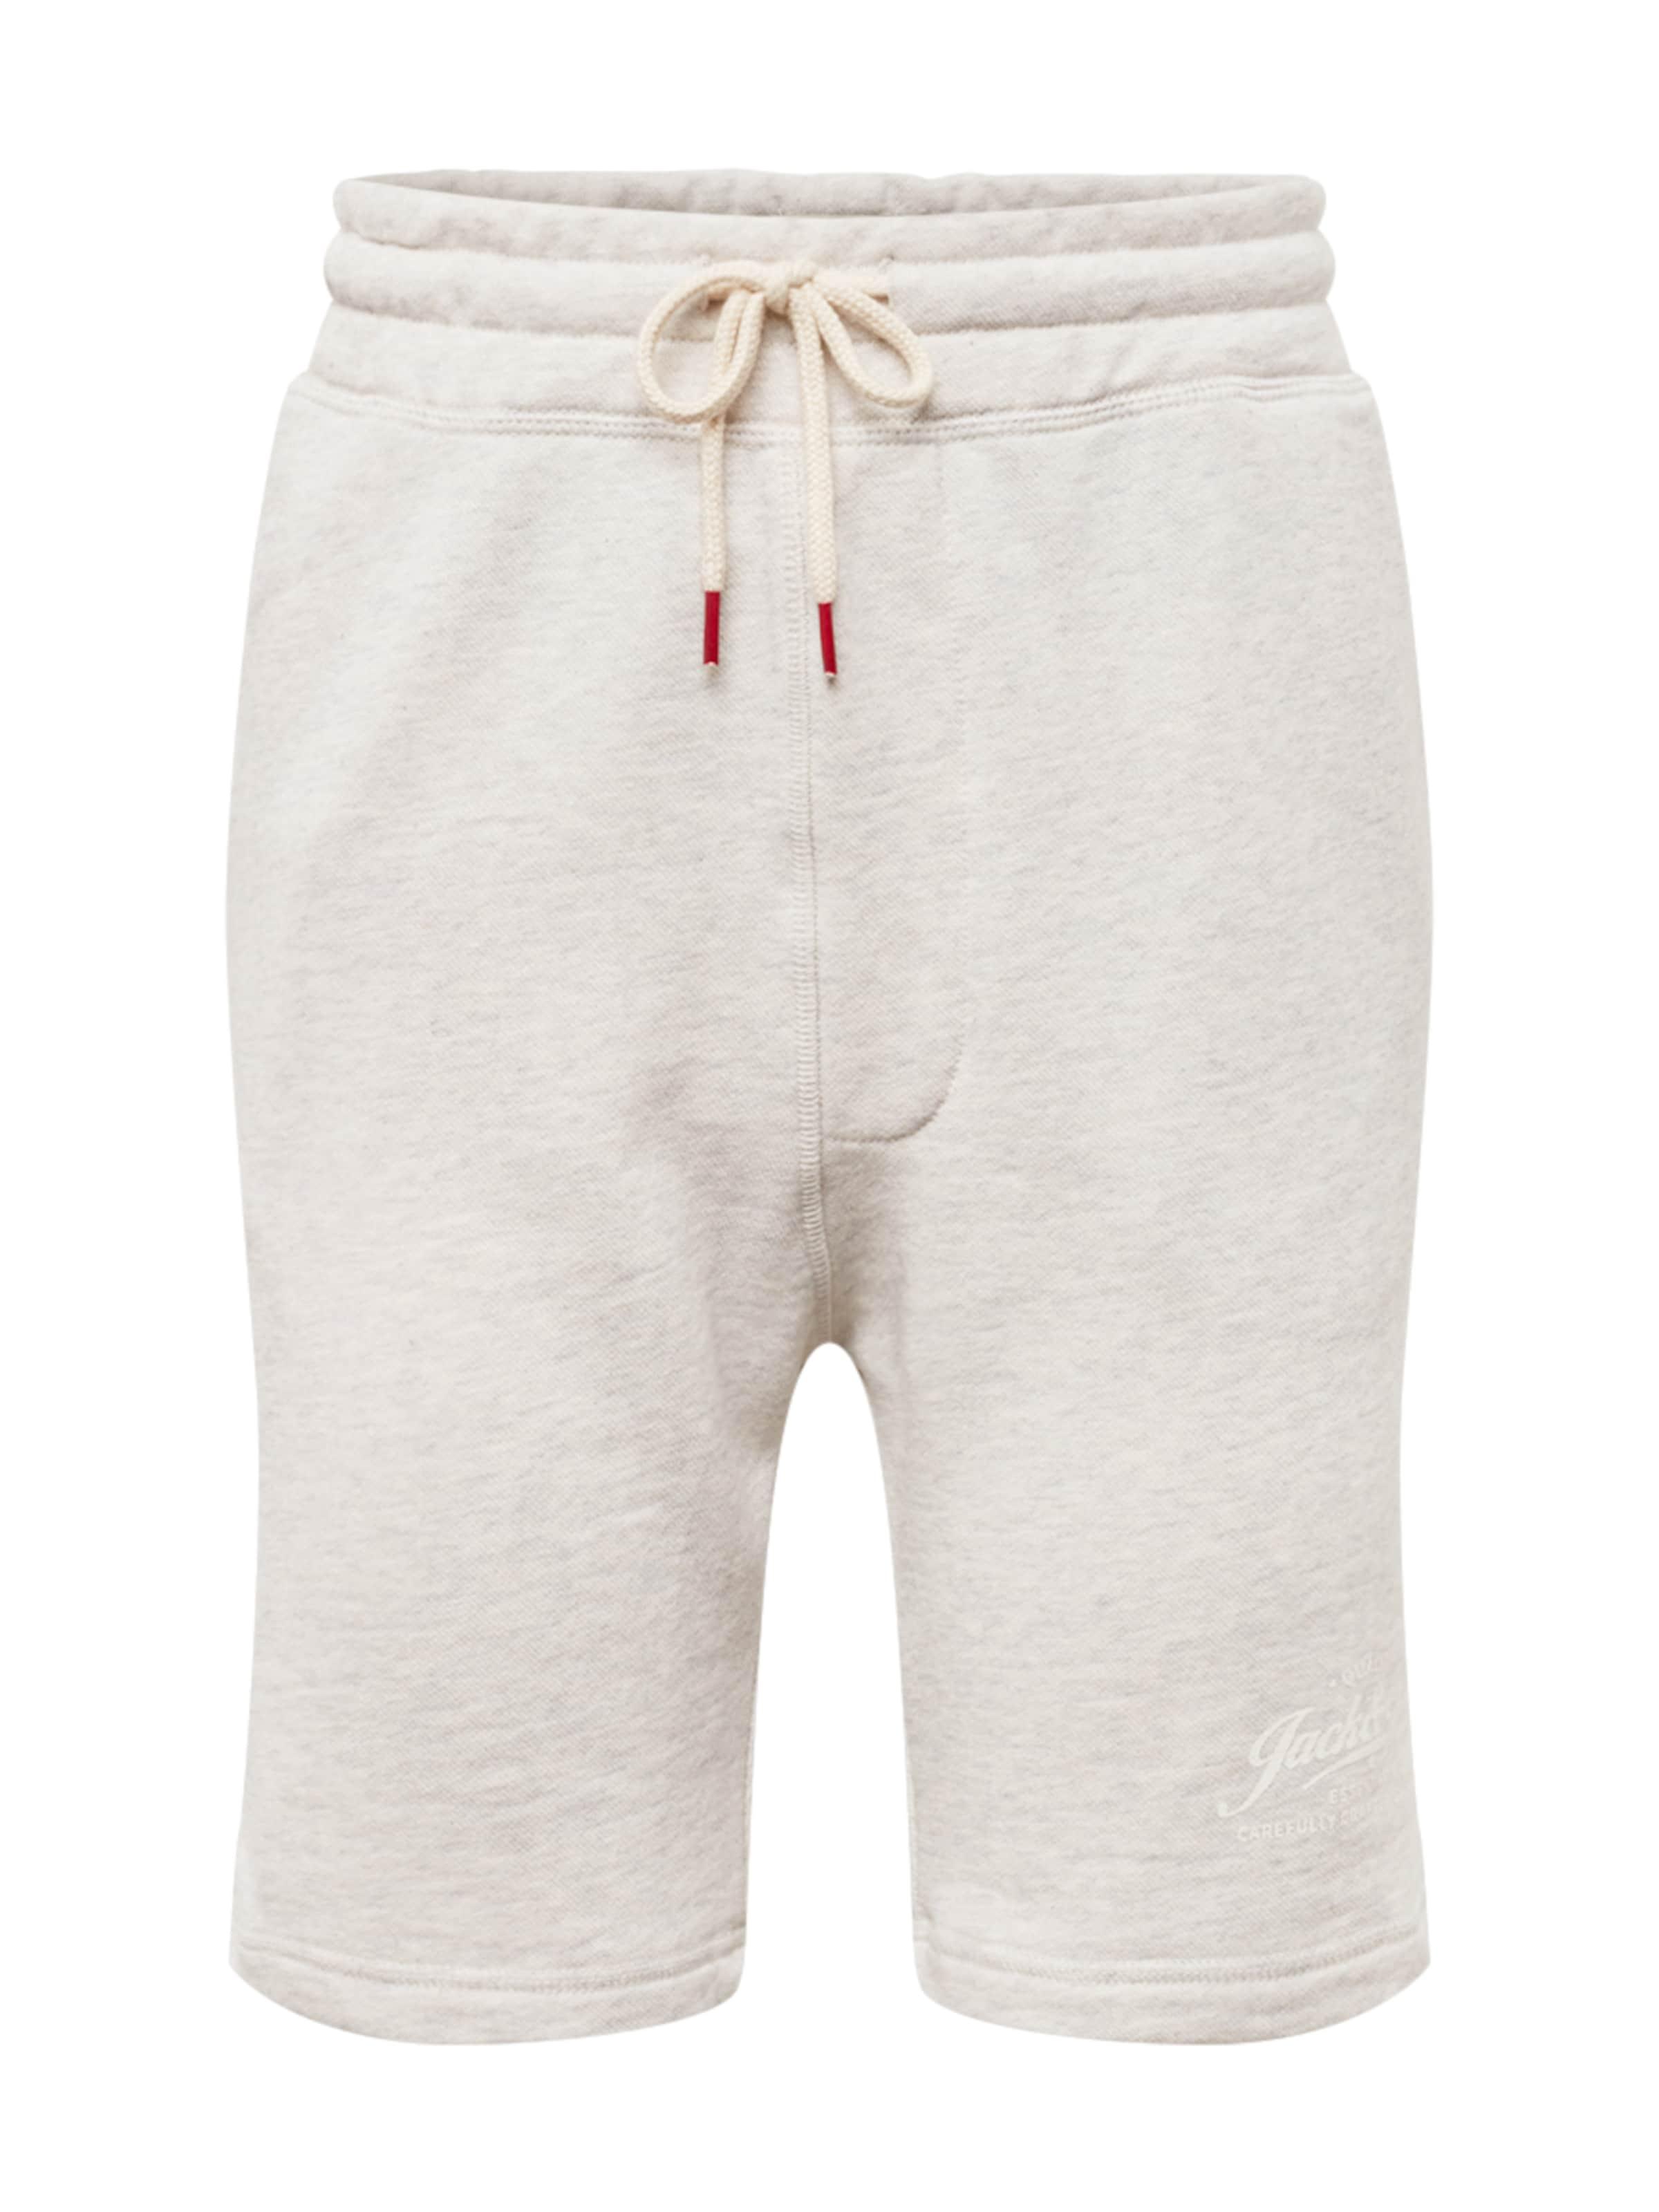 Jackamp; En Chiné Noir Pantalon Jones qAL354jcR